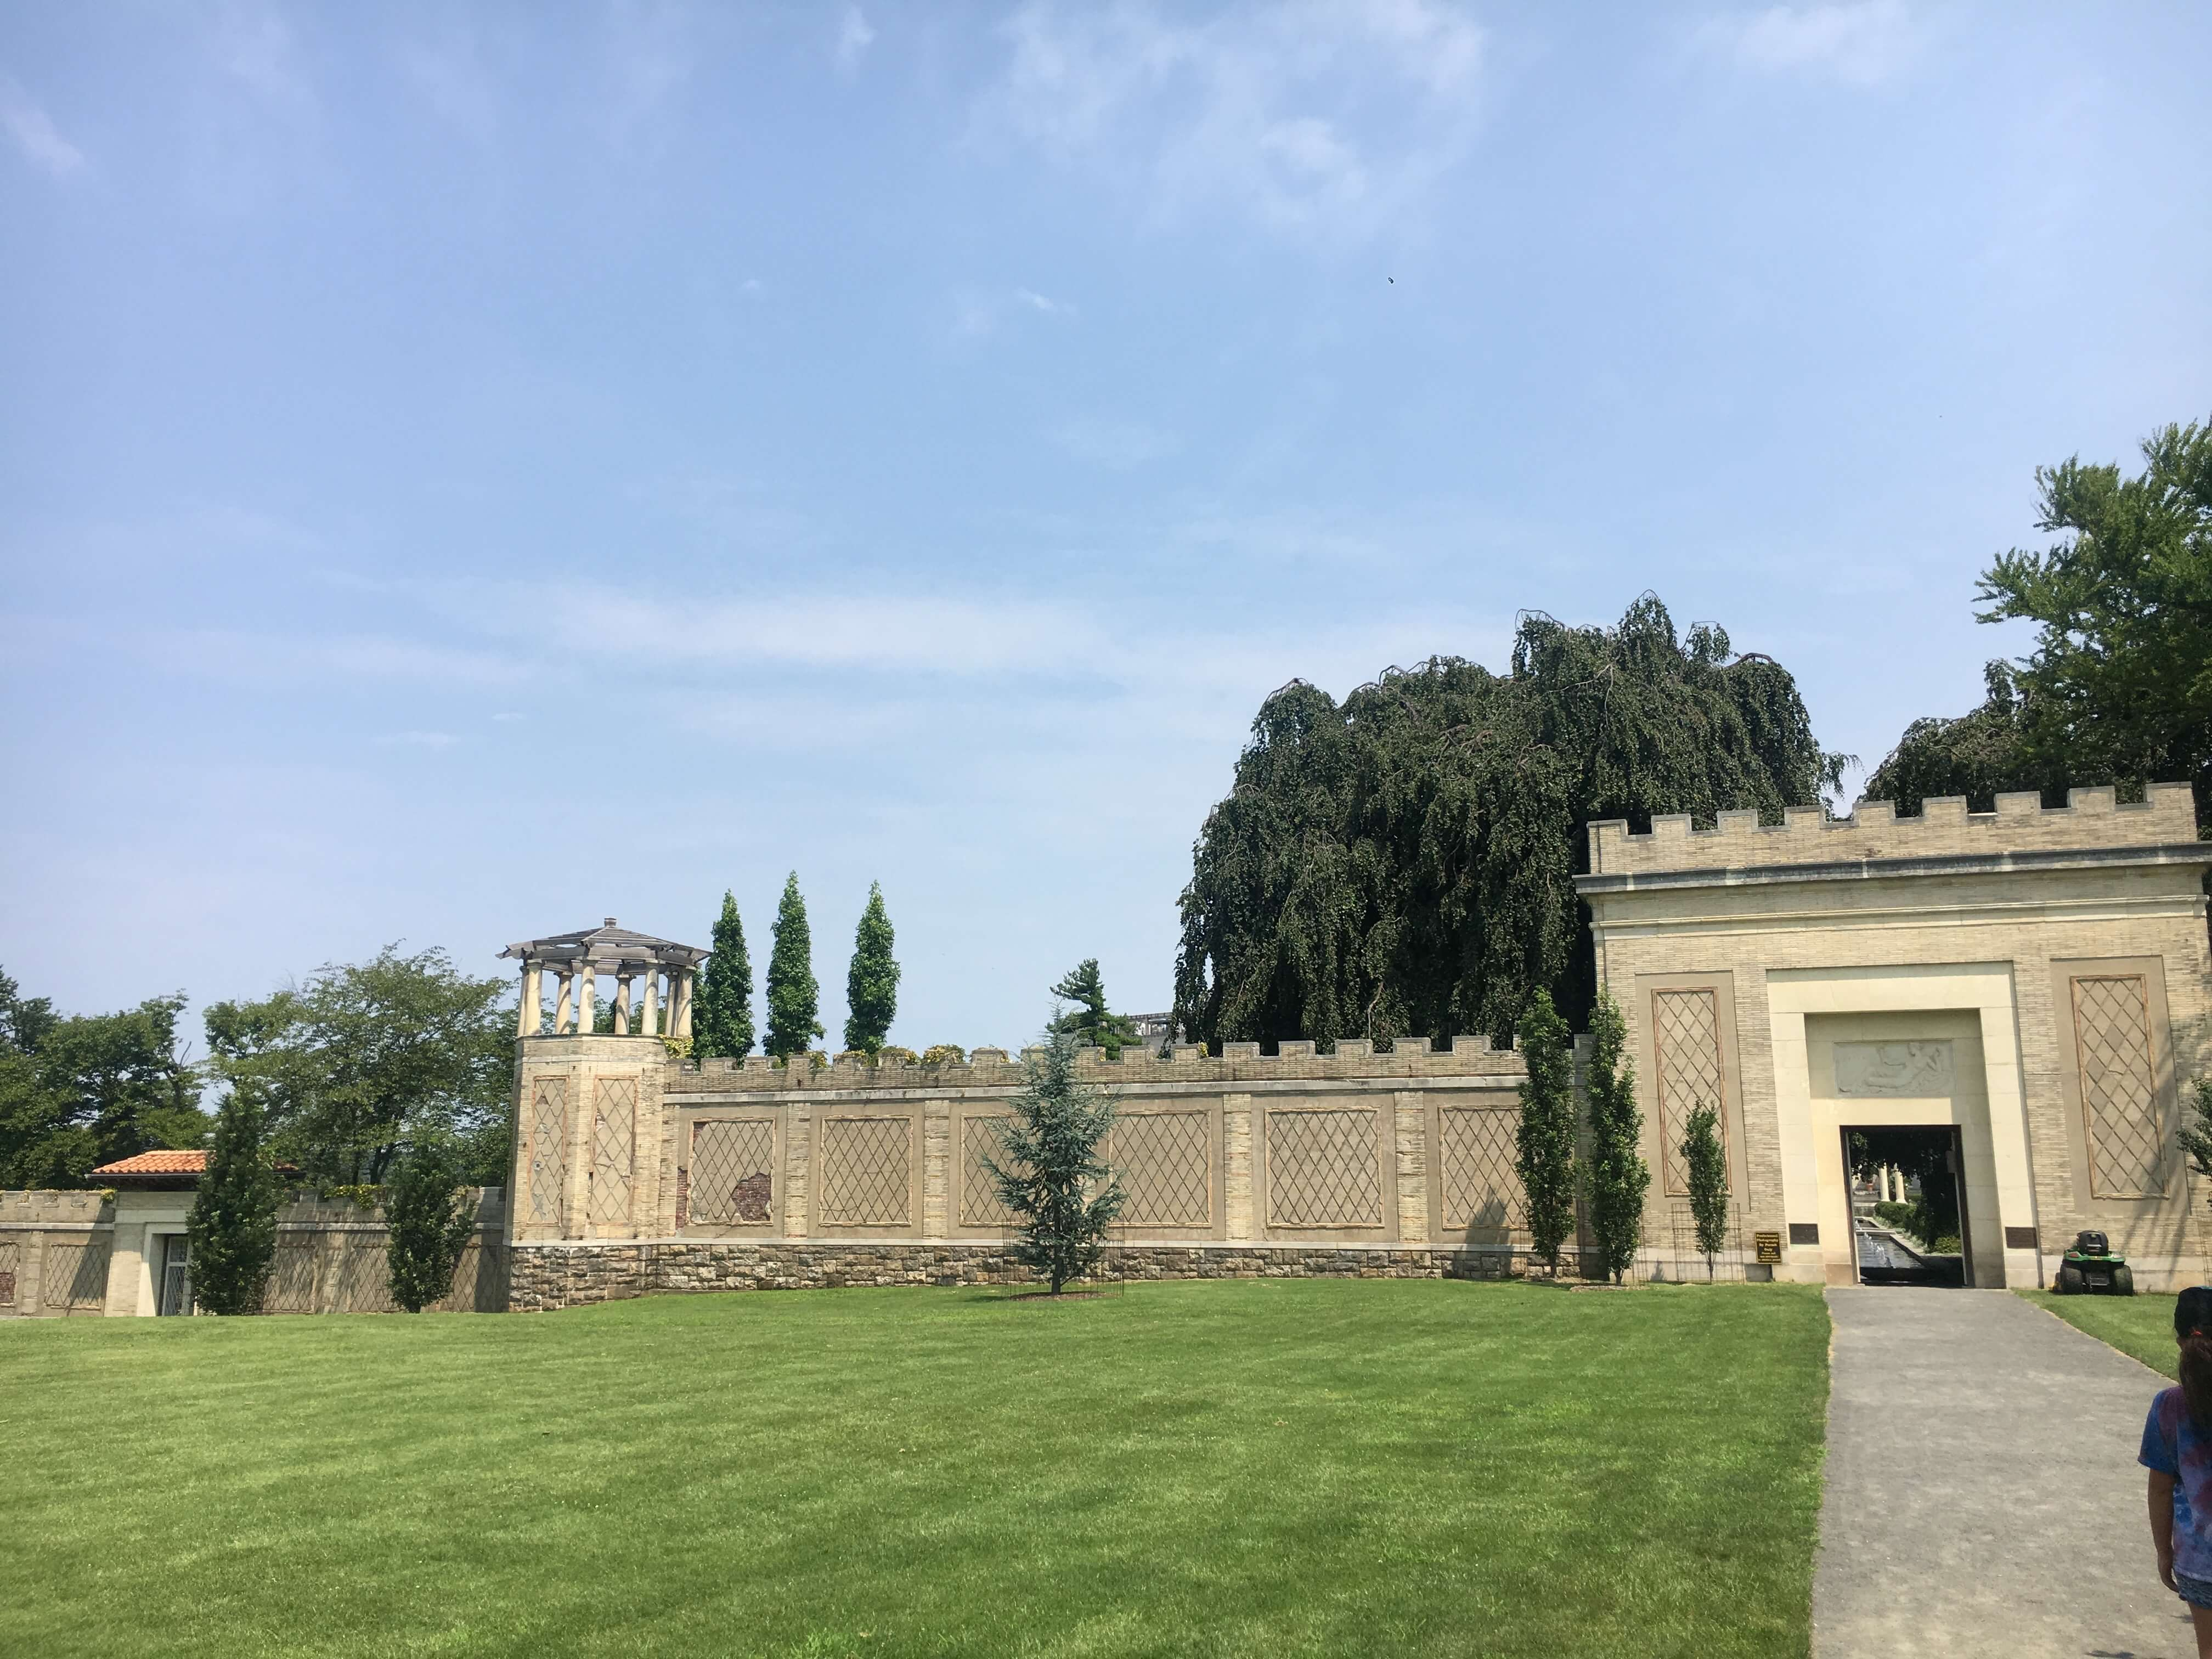 Untermyer Gardens Conservatory Amazing Historic Park In Ny